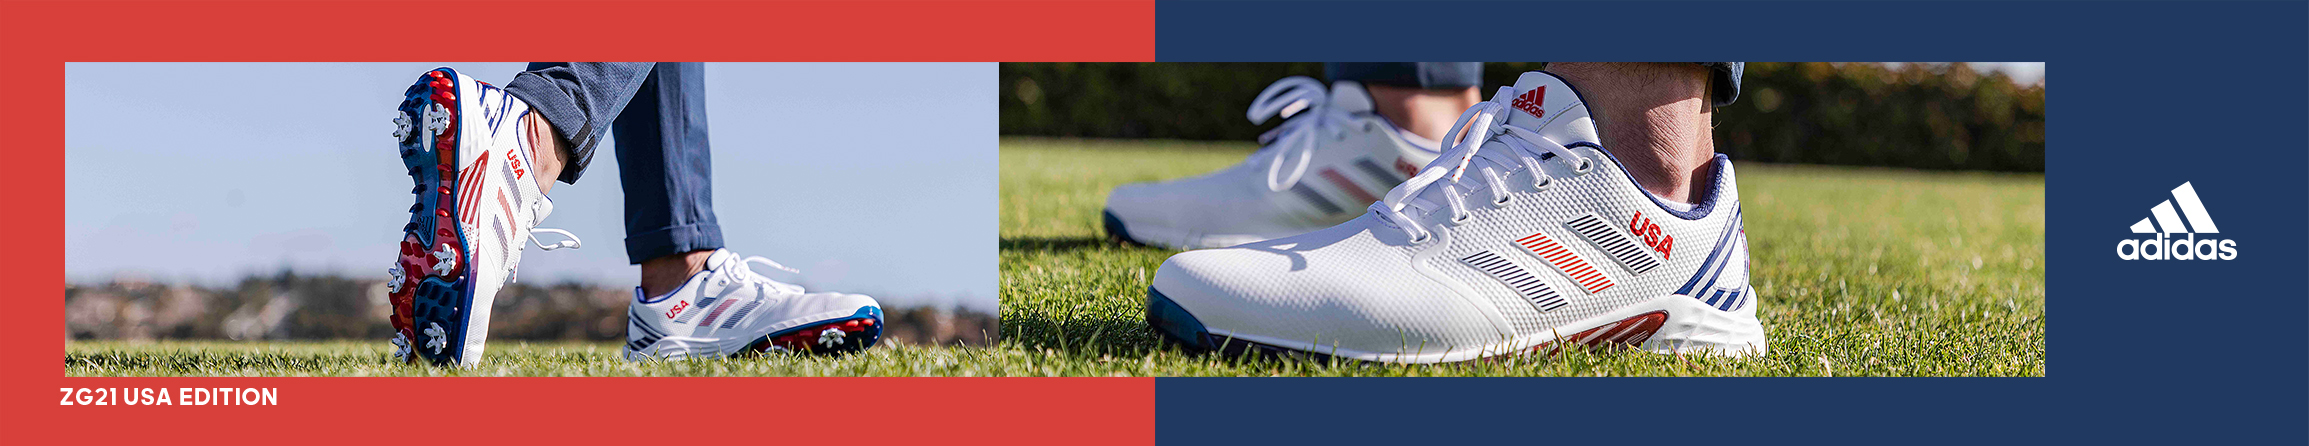 Adidas ZG21 USA edition